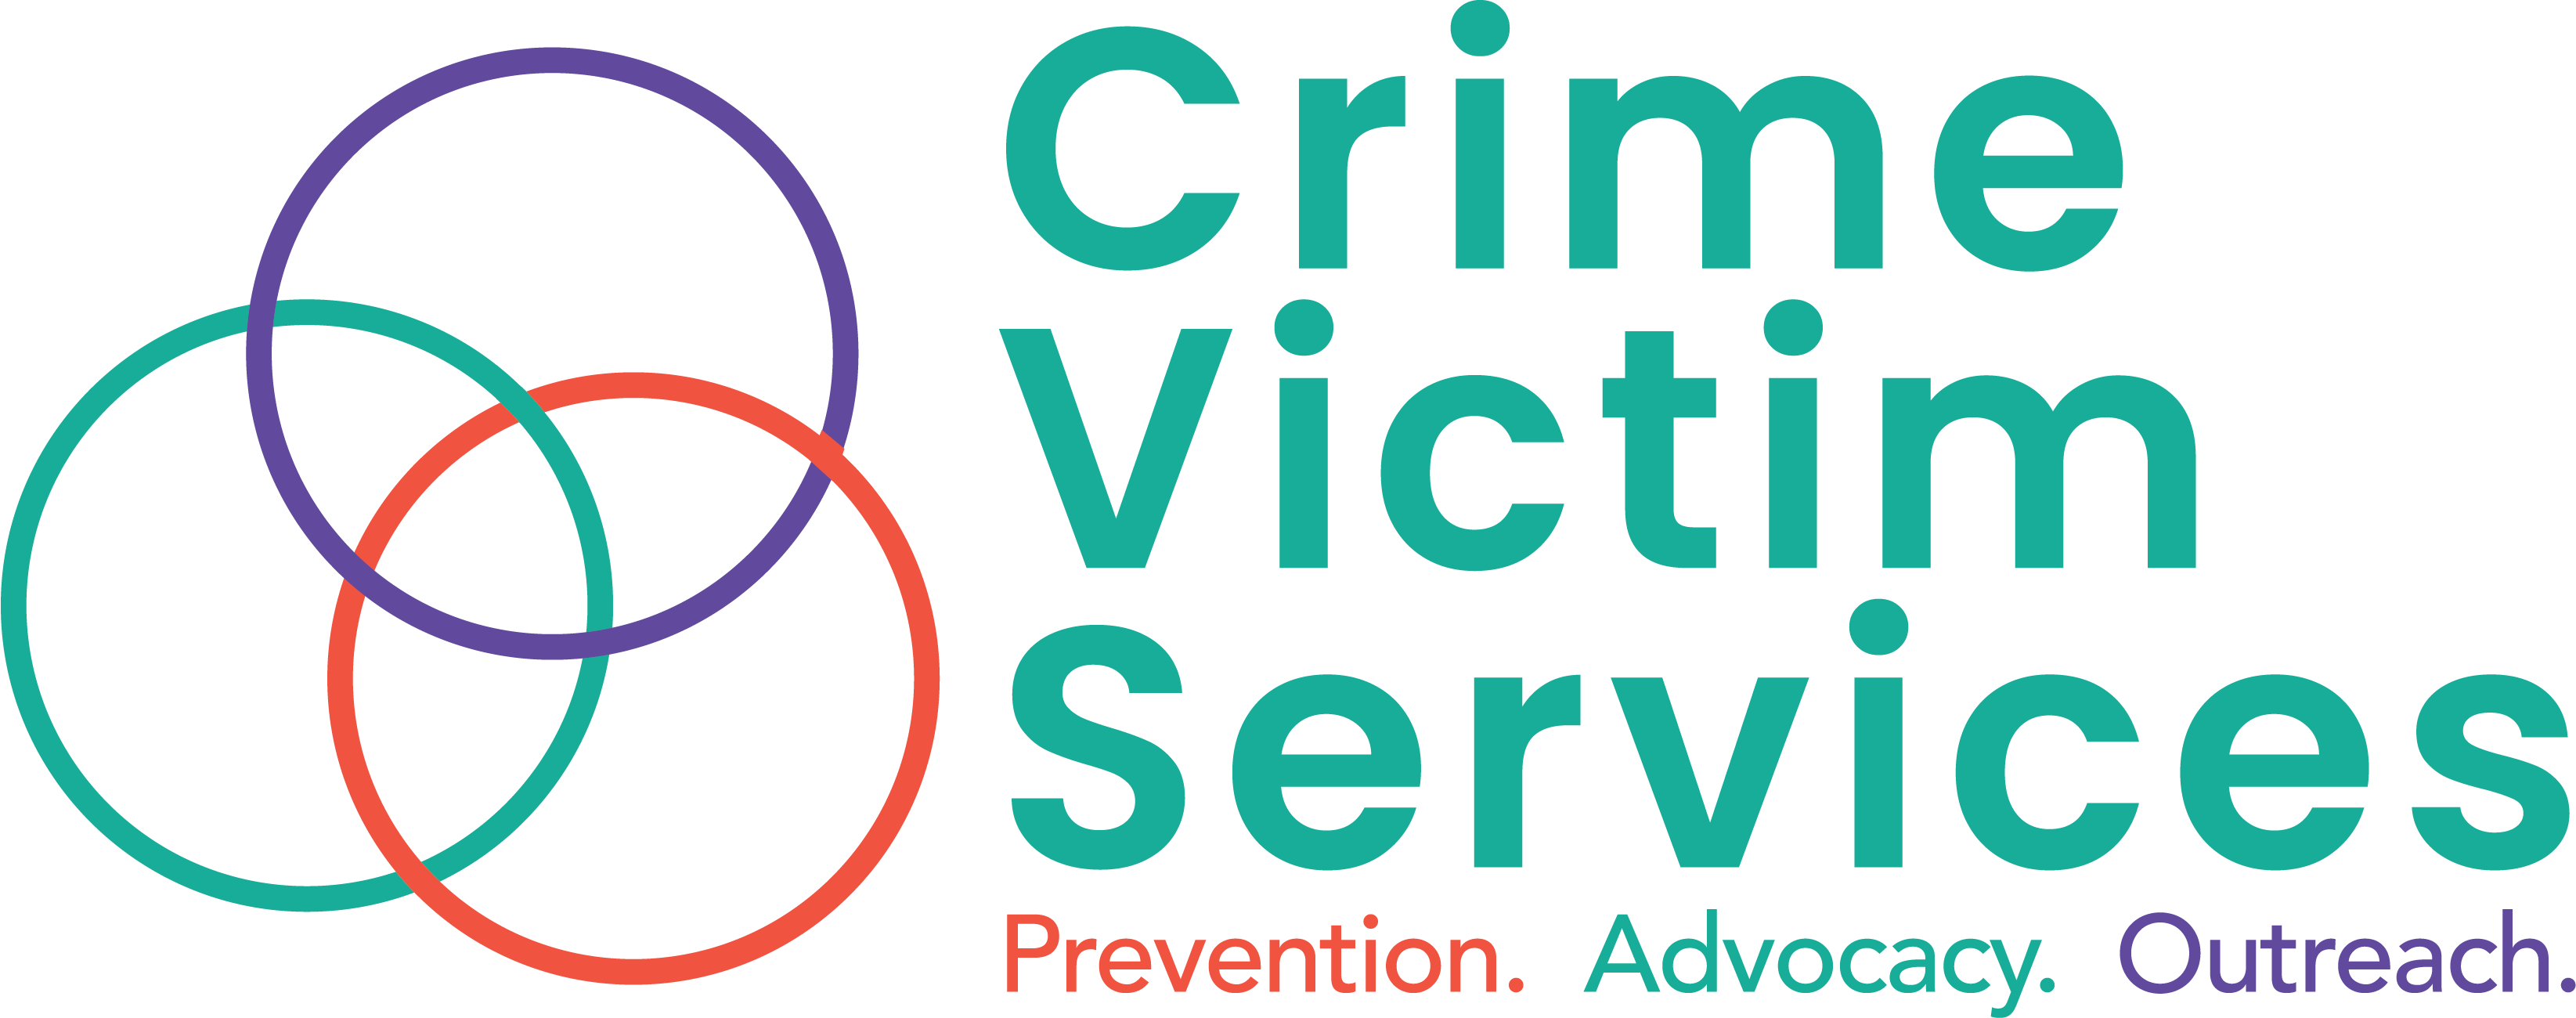 Cvs logos color